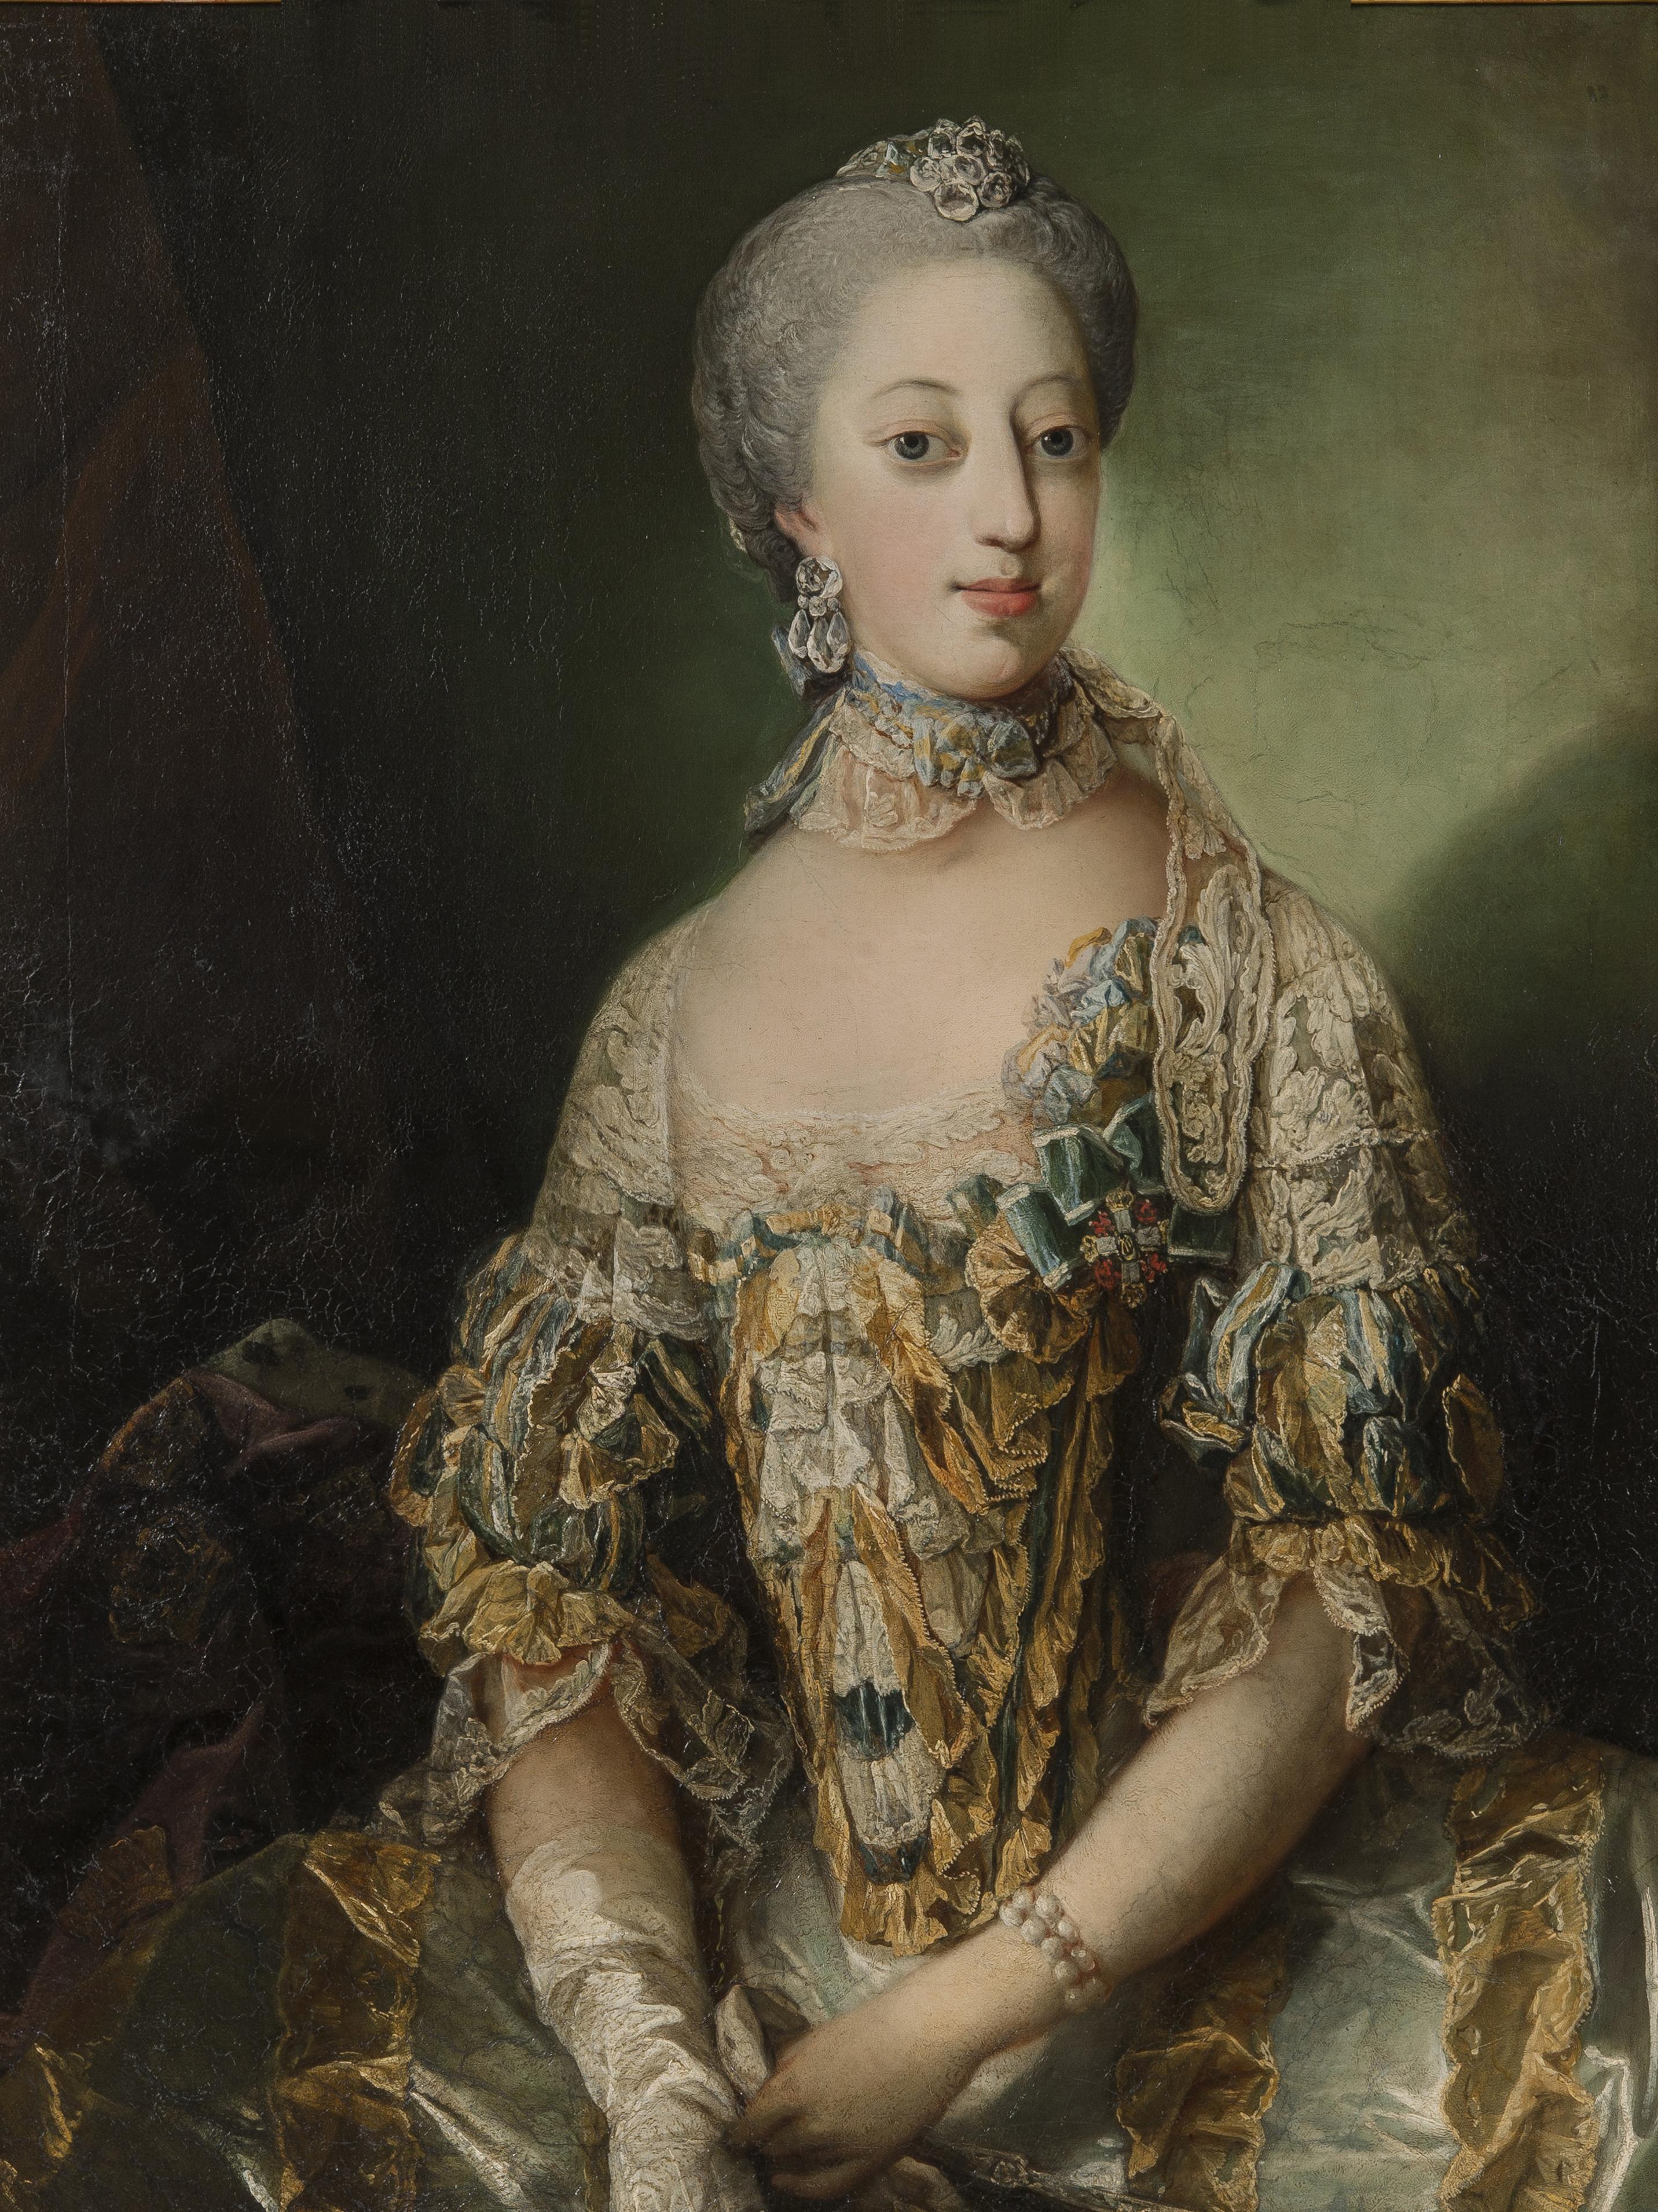 https://upload.wikimedia.org/wikipedia/commons/a/a0/Sophiemagdaleneofdenmark_queen_of_sweden.jpg